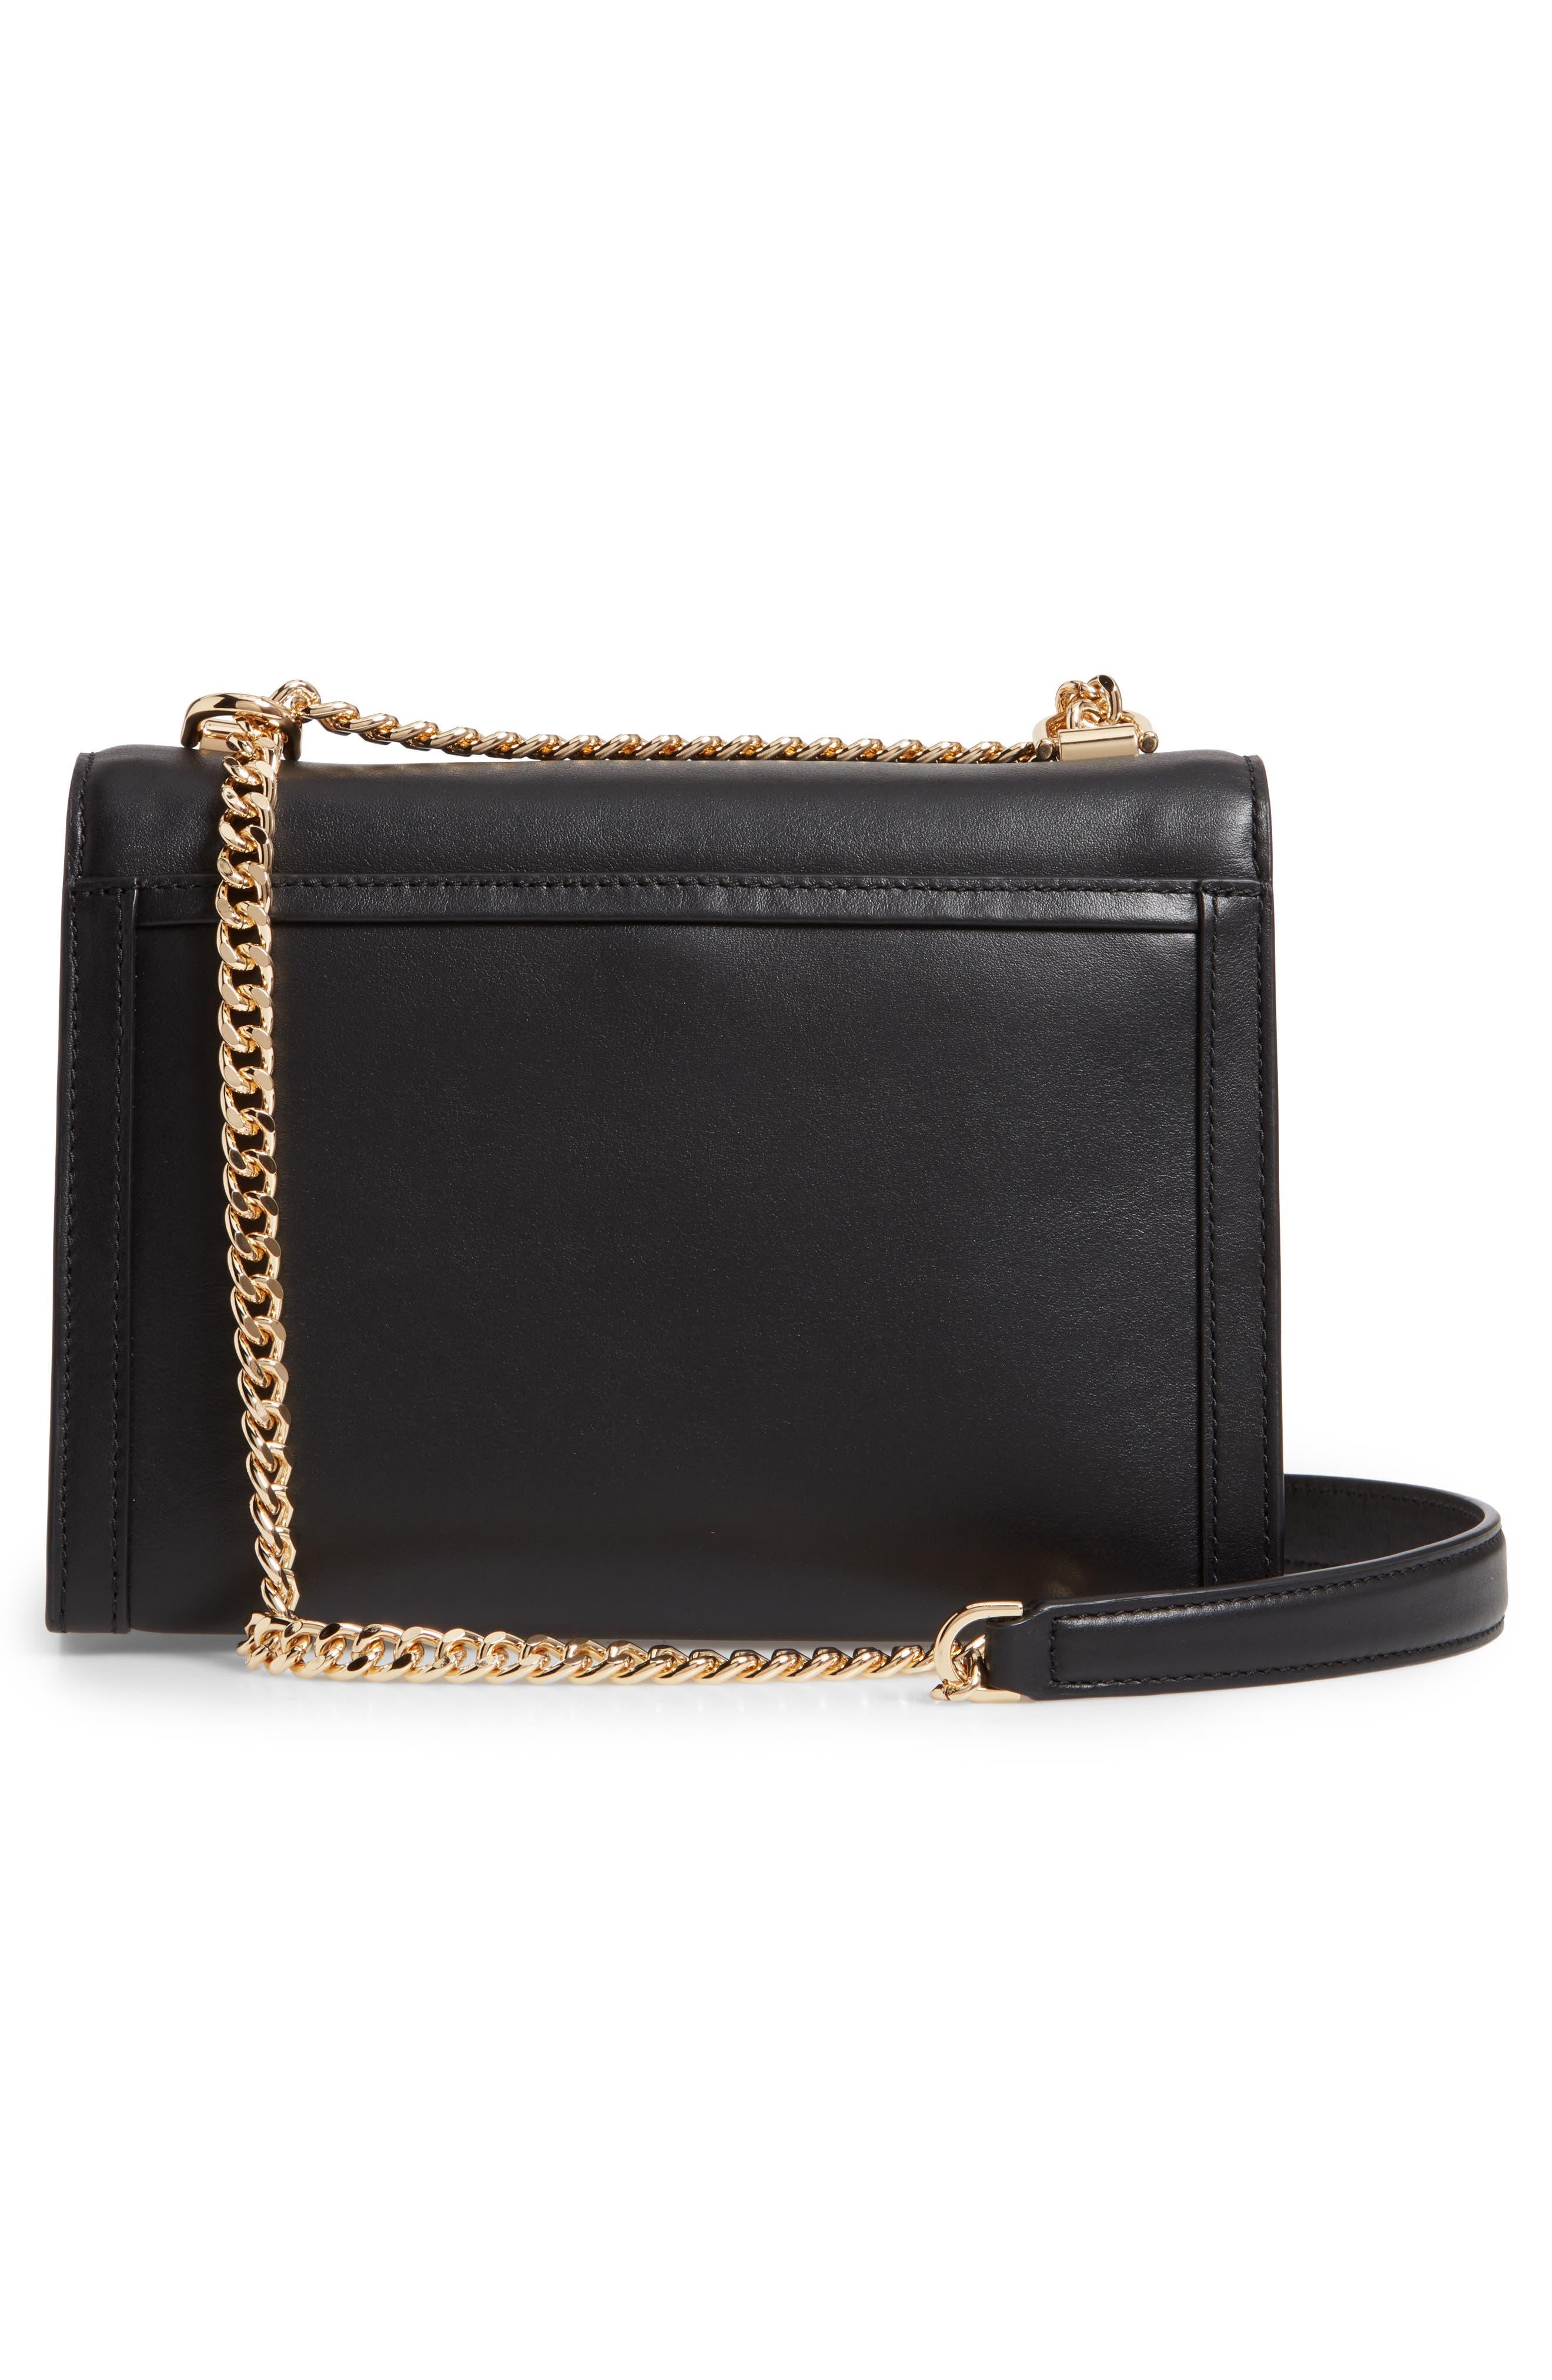 MICHAEL MICHAEL KORS,                             Large Whitney Leather Shoulder Bag,                             Alternate thumbnail 3, color,                             BLACK